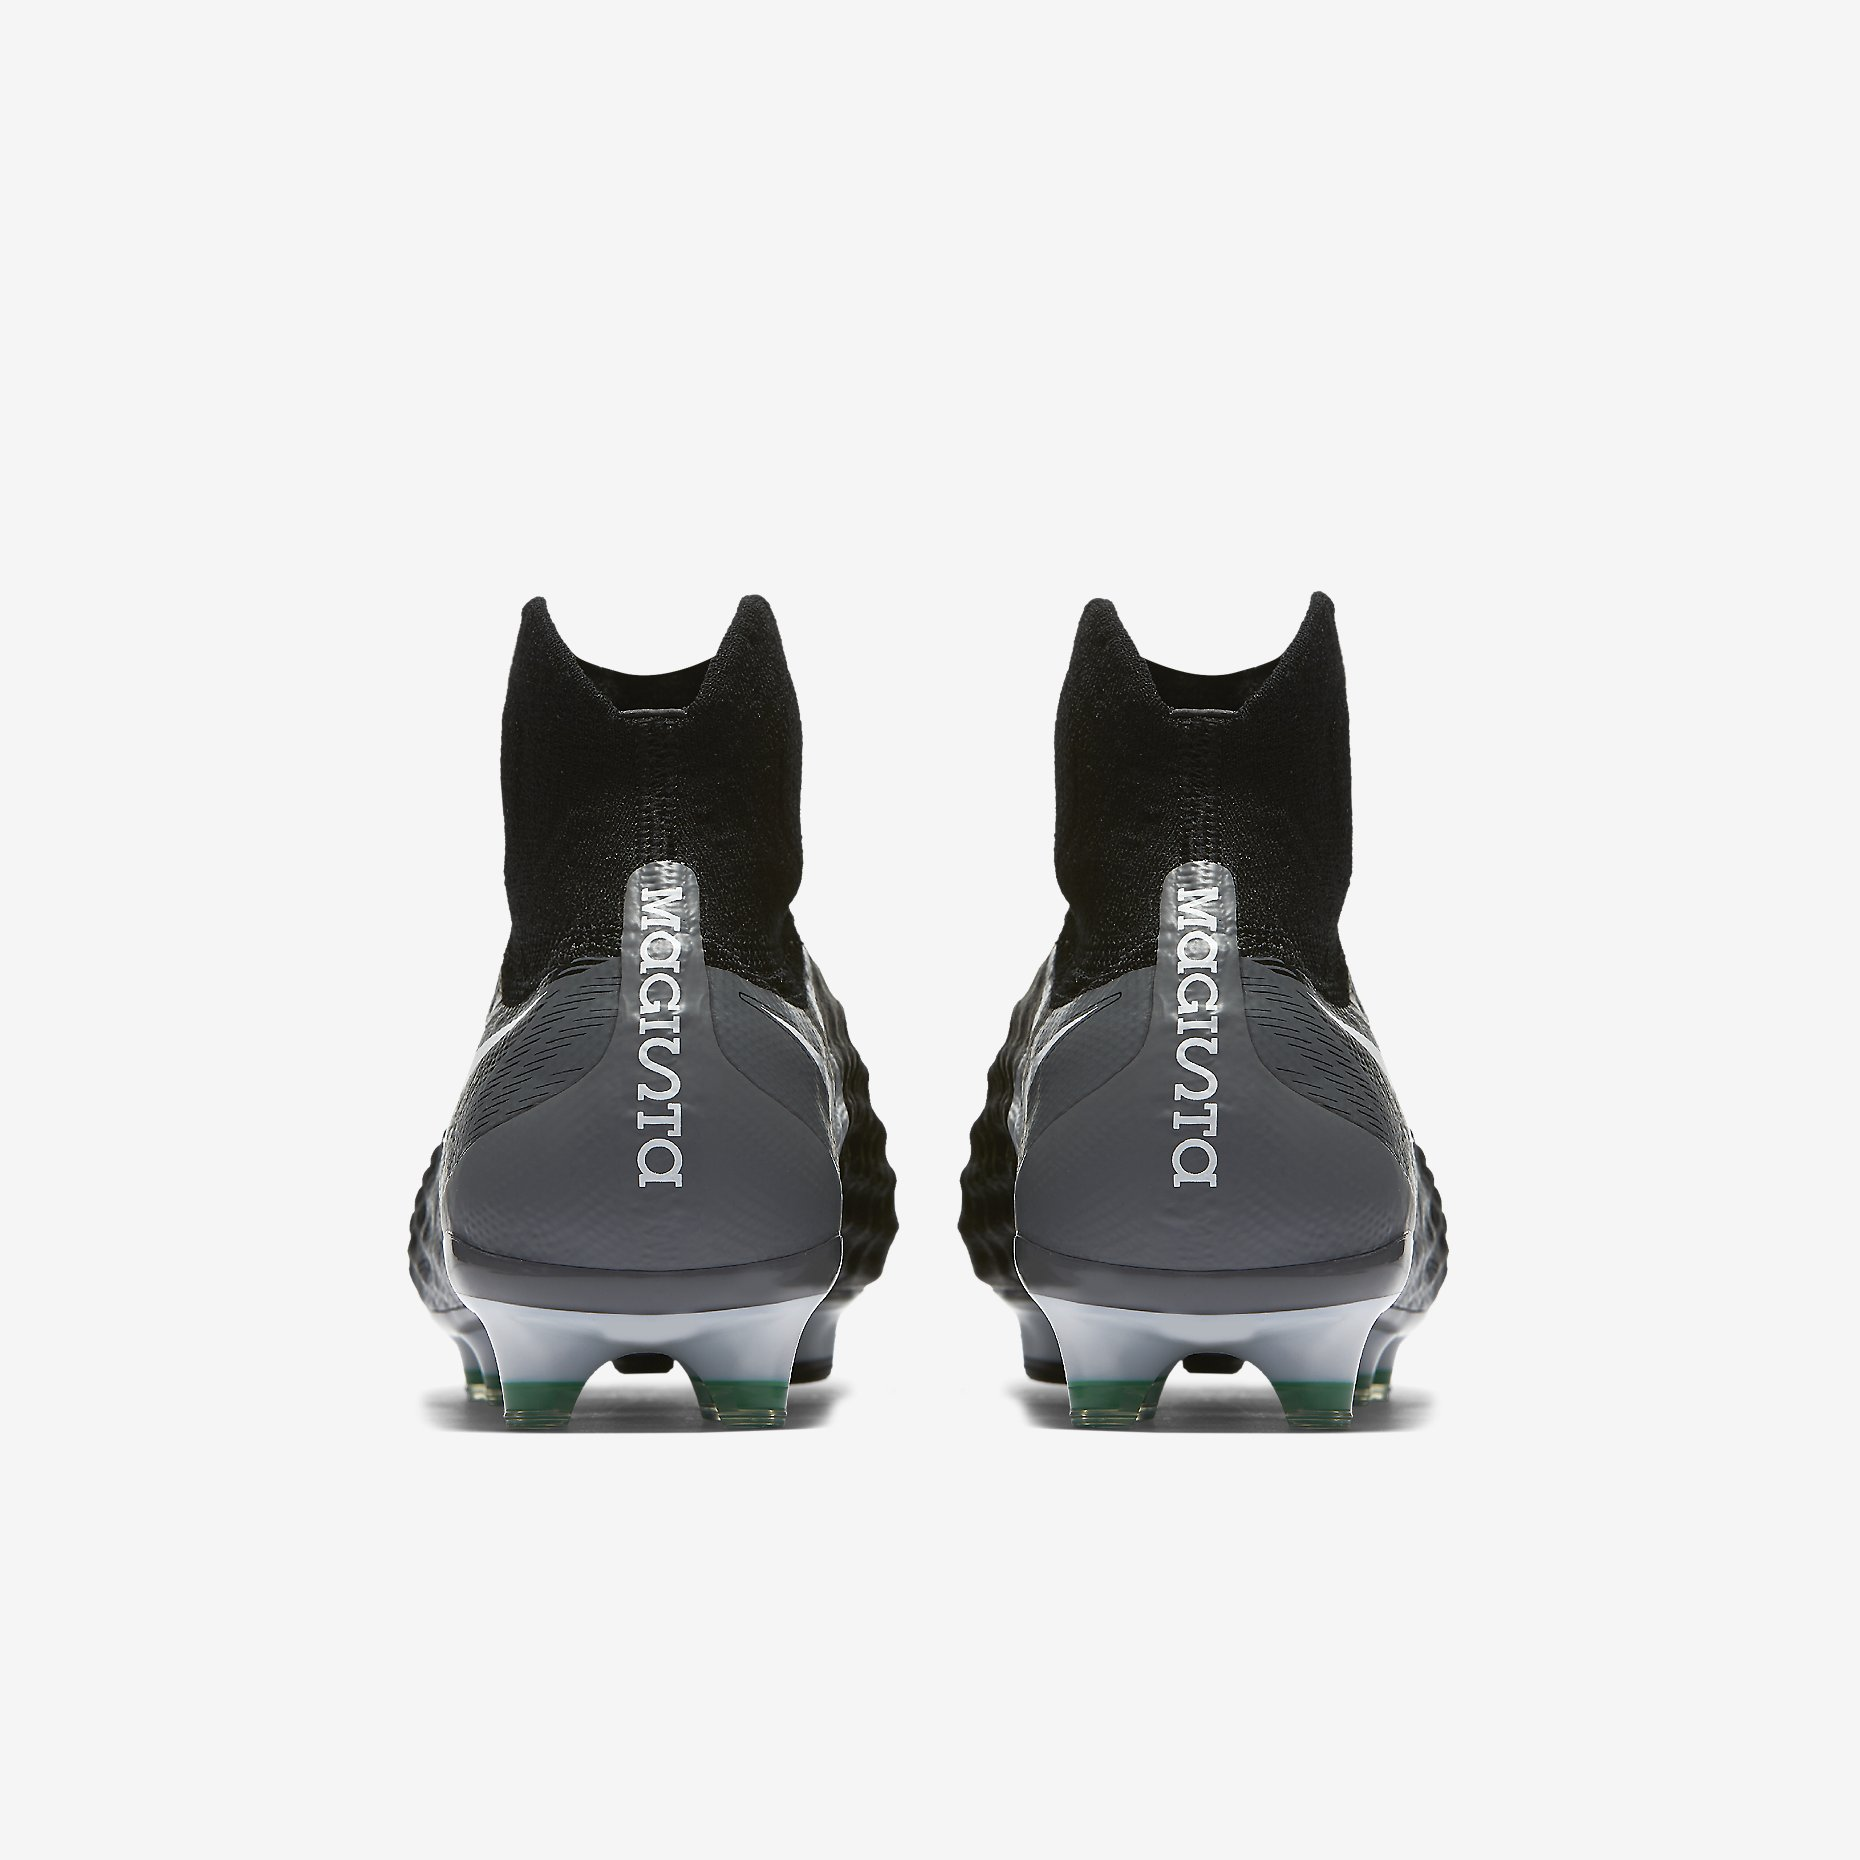 Stadium pack fts15 boots sorğusuna uyğun şekilleri pulsuz